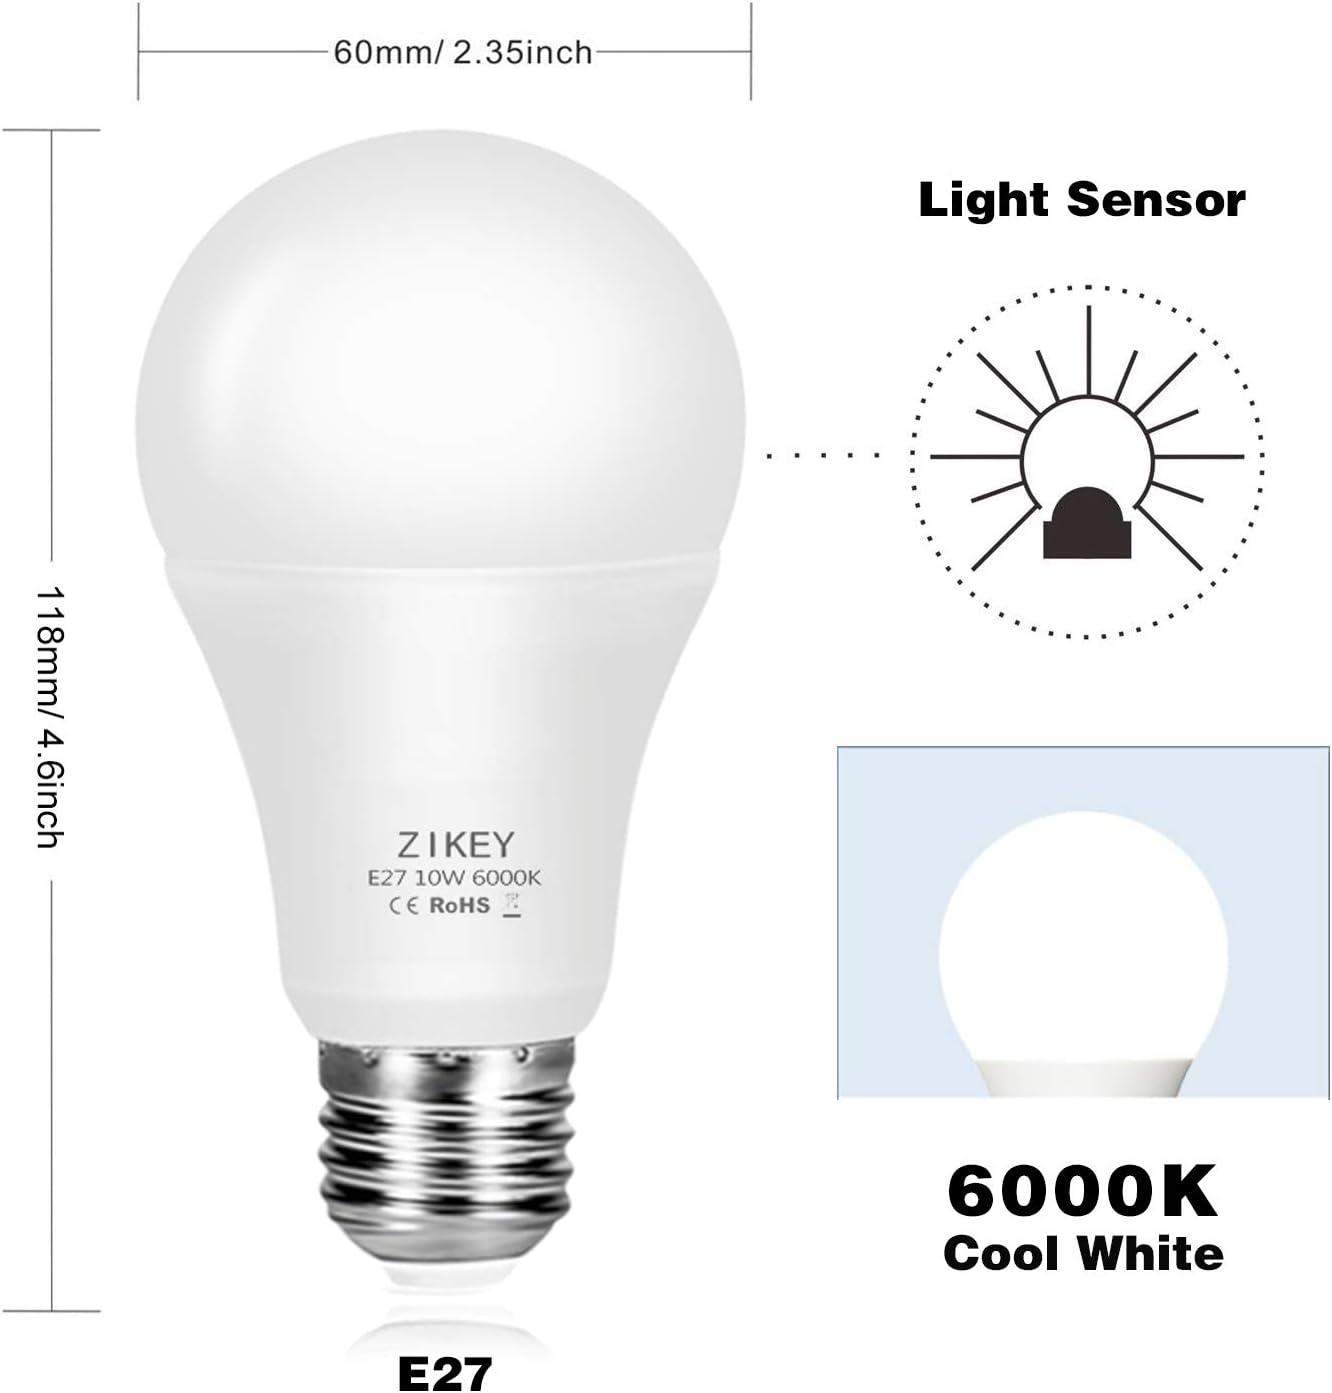 ZIKEY Bombilla Sensor Crepuscular, E27 10W Bombilla Led de Luz ...